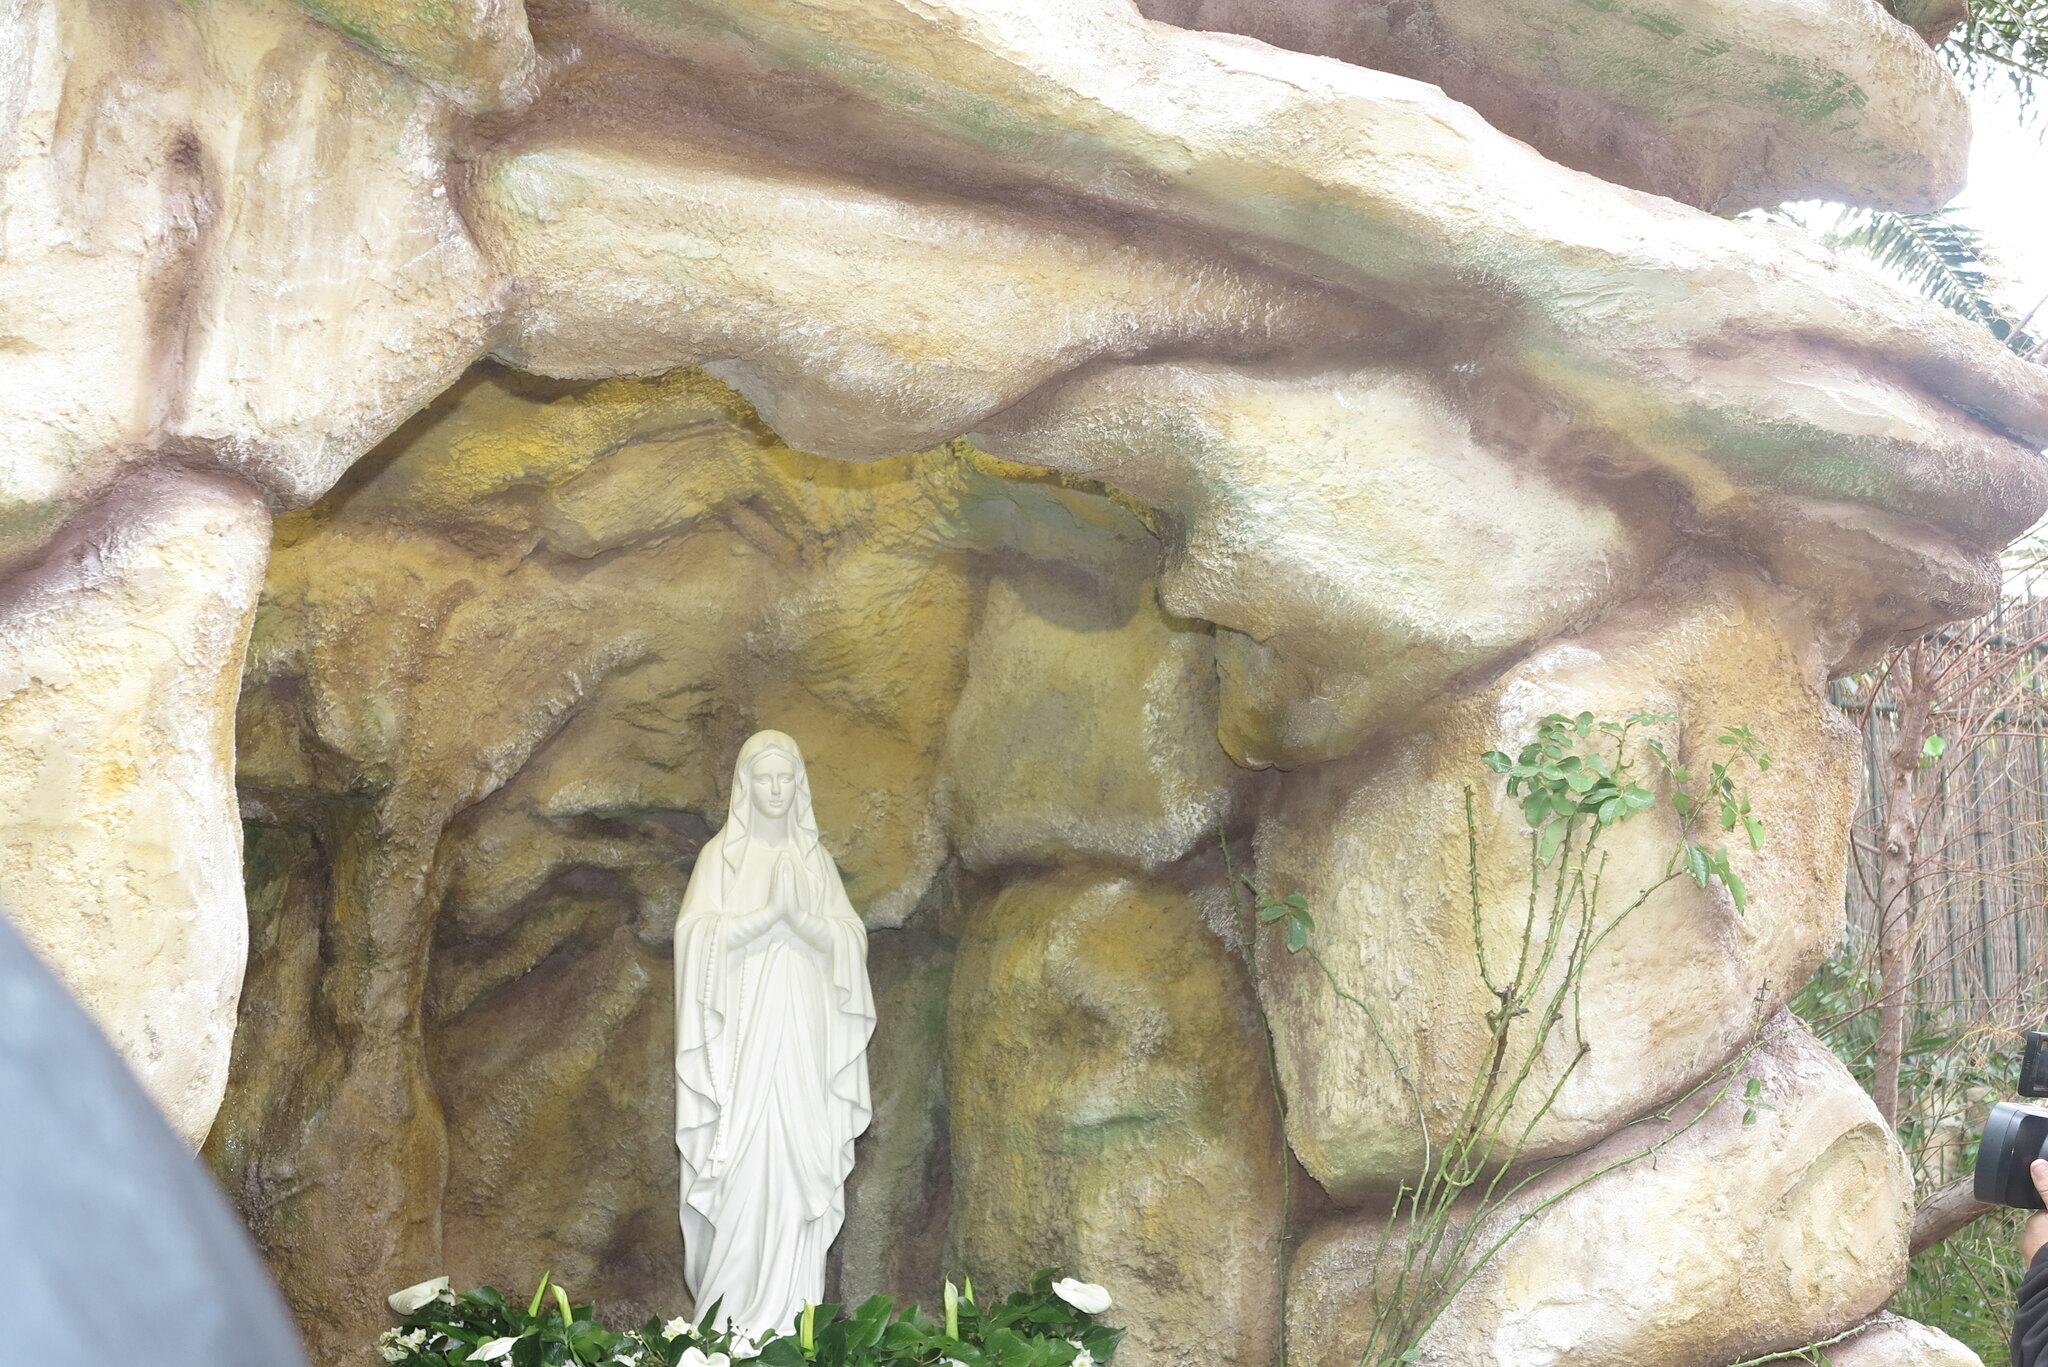 (2016-02-13) - Inauguración Virgen de Lourdes, La Molineta - Archivo La Molineta 2 (44)